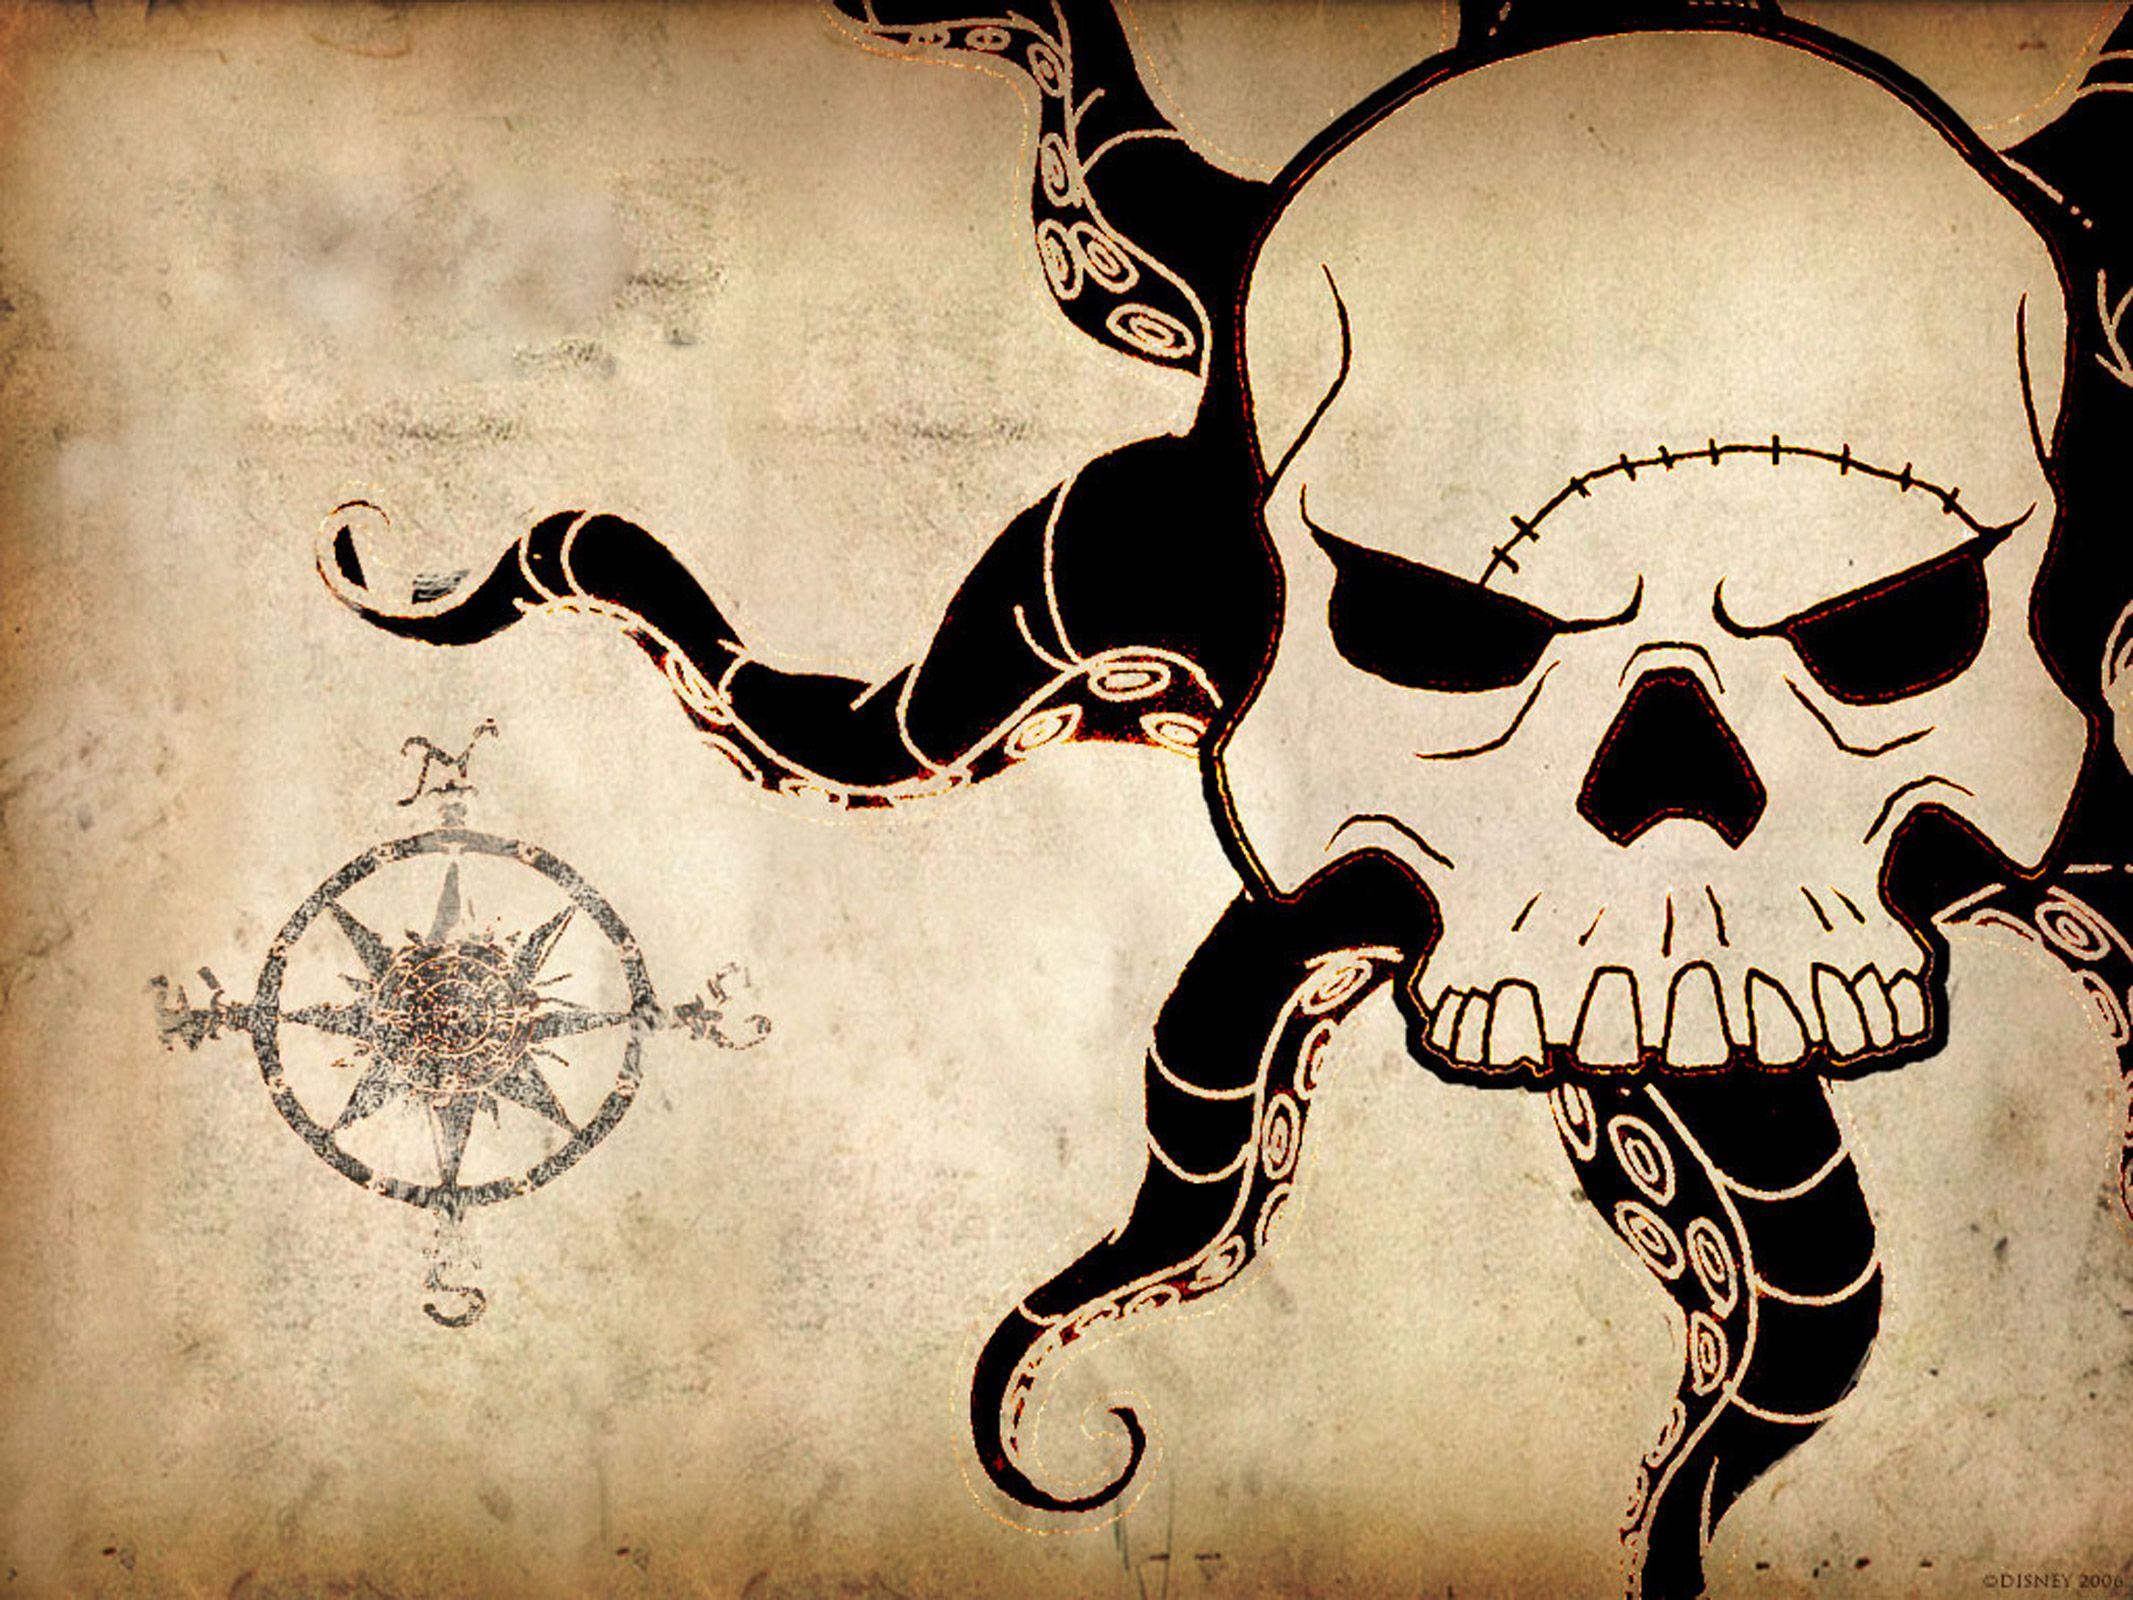 Kraken Map Wallpapers 2133x1600 786698 Movie Poster Art Pirates Of The Caribbean Pineapple Art